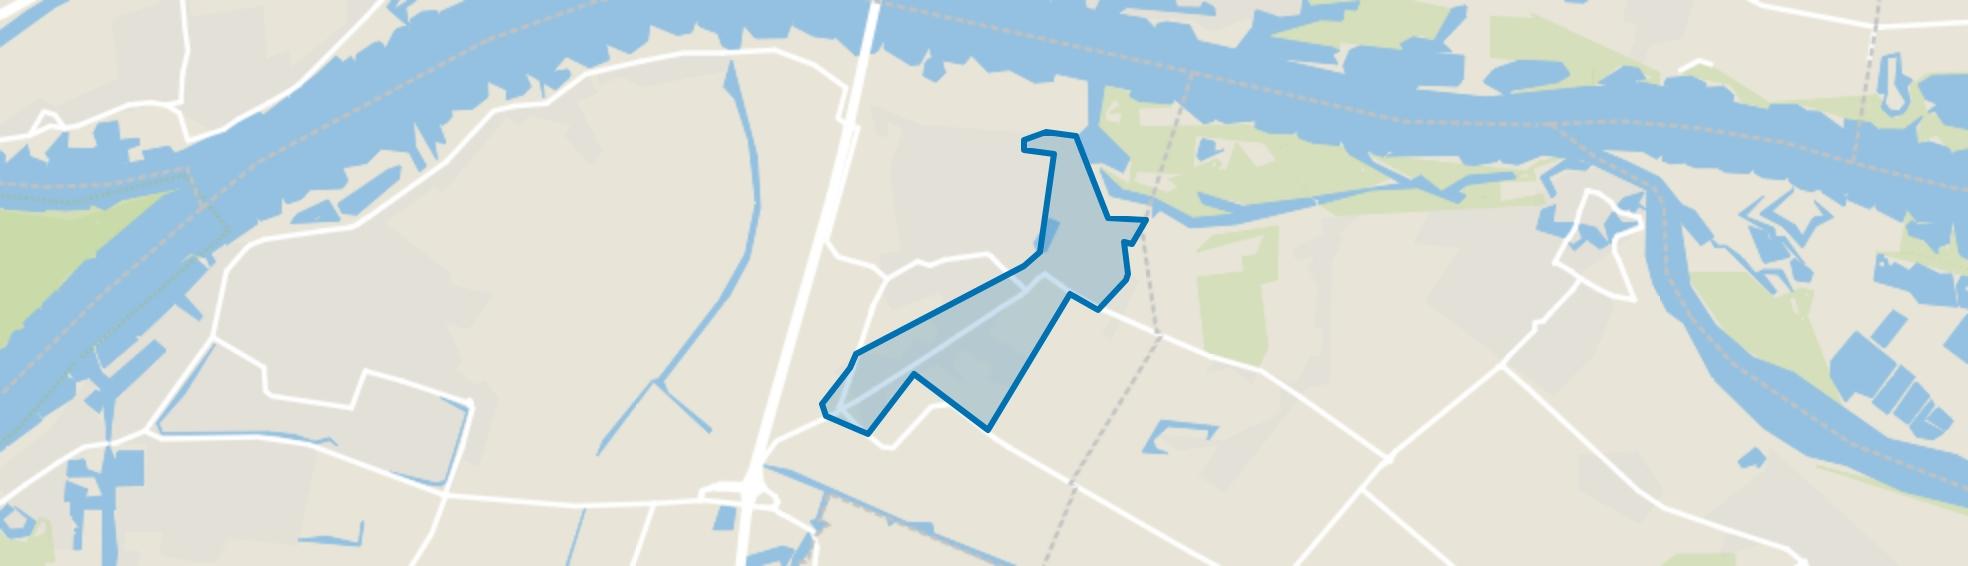 Sleeuwijk oost, Sleeuwijk map